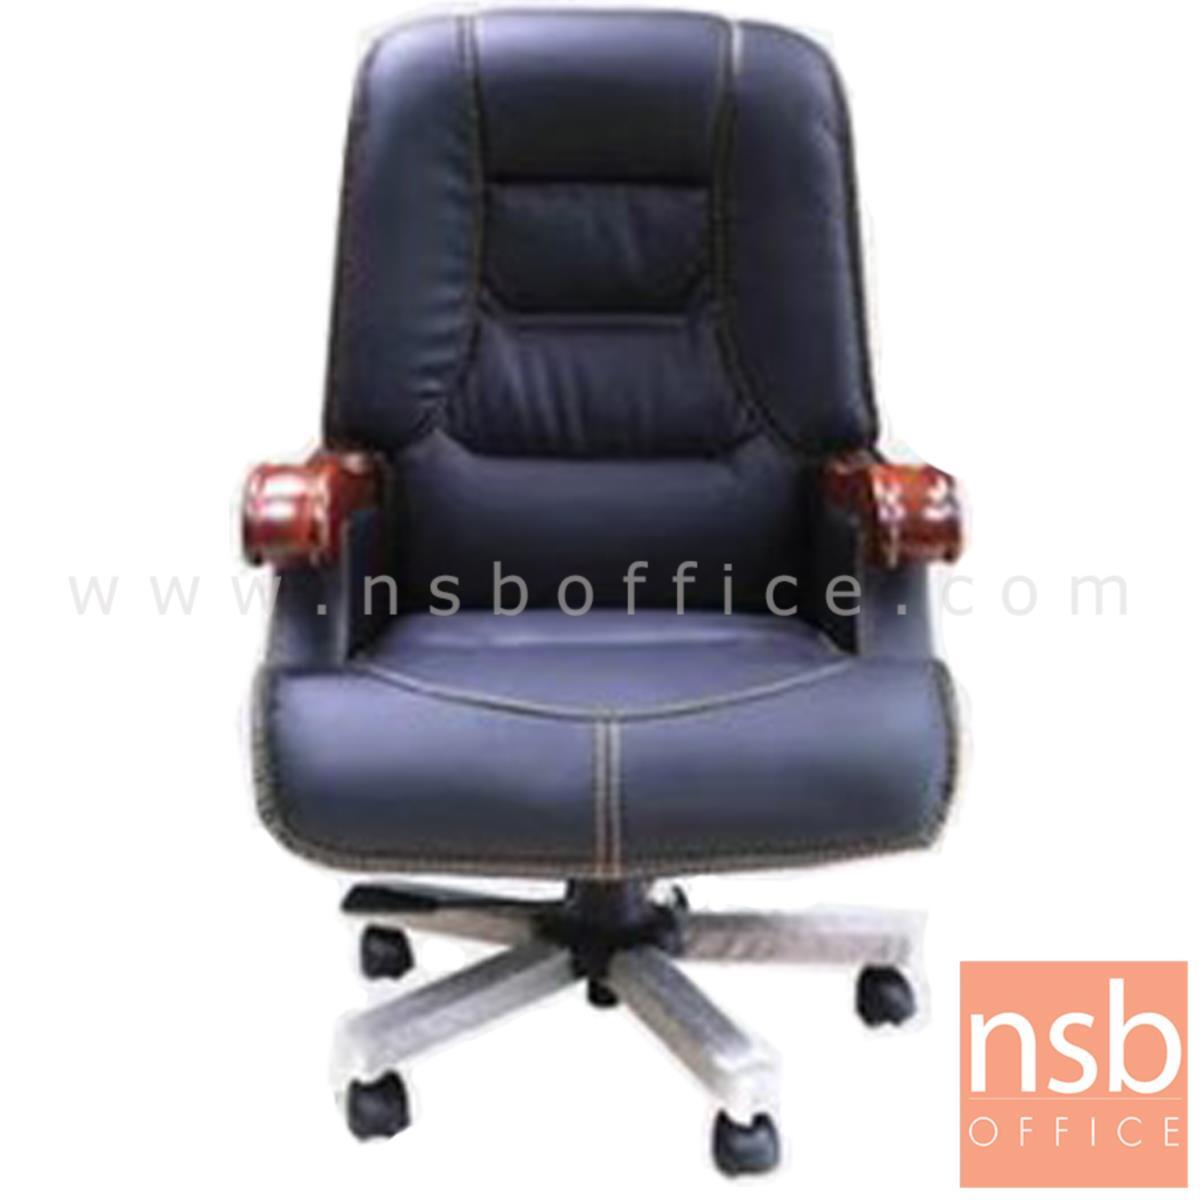 B25A139:เก้าอี้ผู้บริหารหนัง PU  รุ่น DAMASK ROSE (ดามาคส โรส)  โช๊คแก๊ส ขาเหล็ก